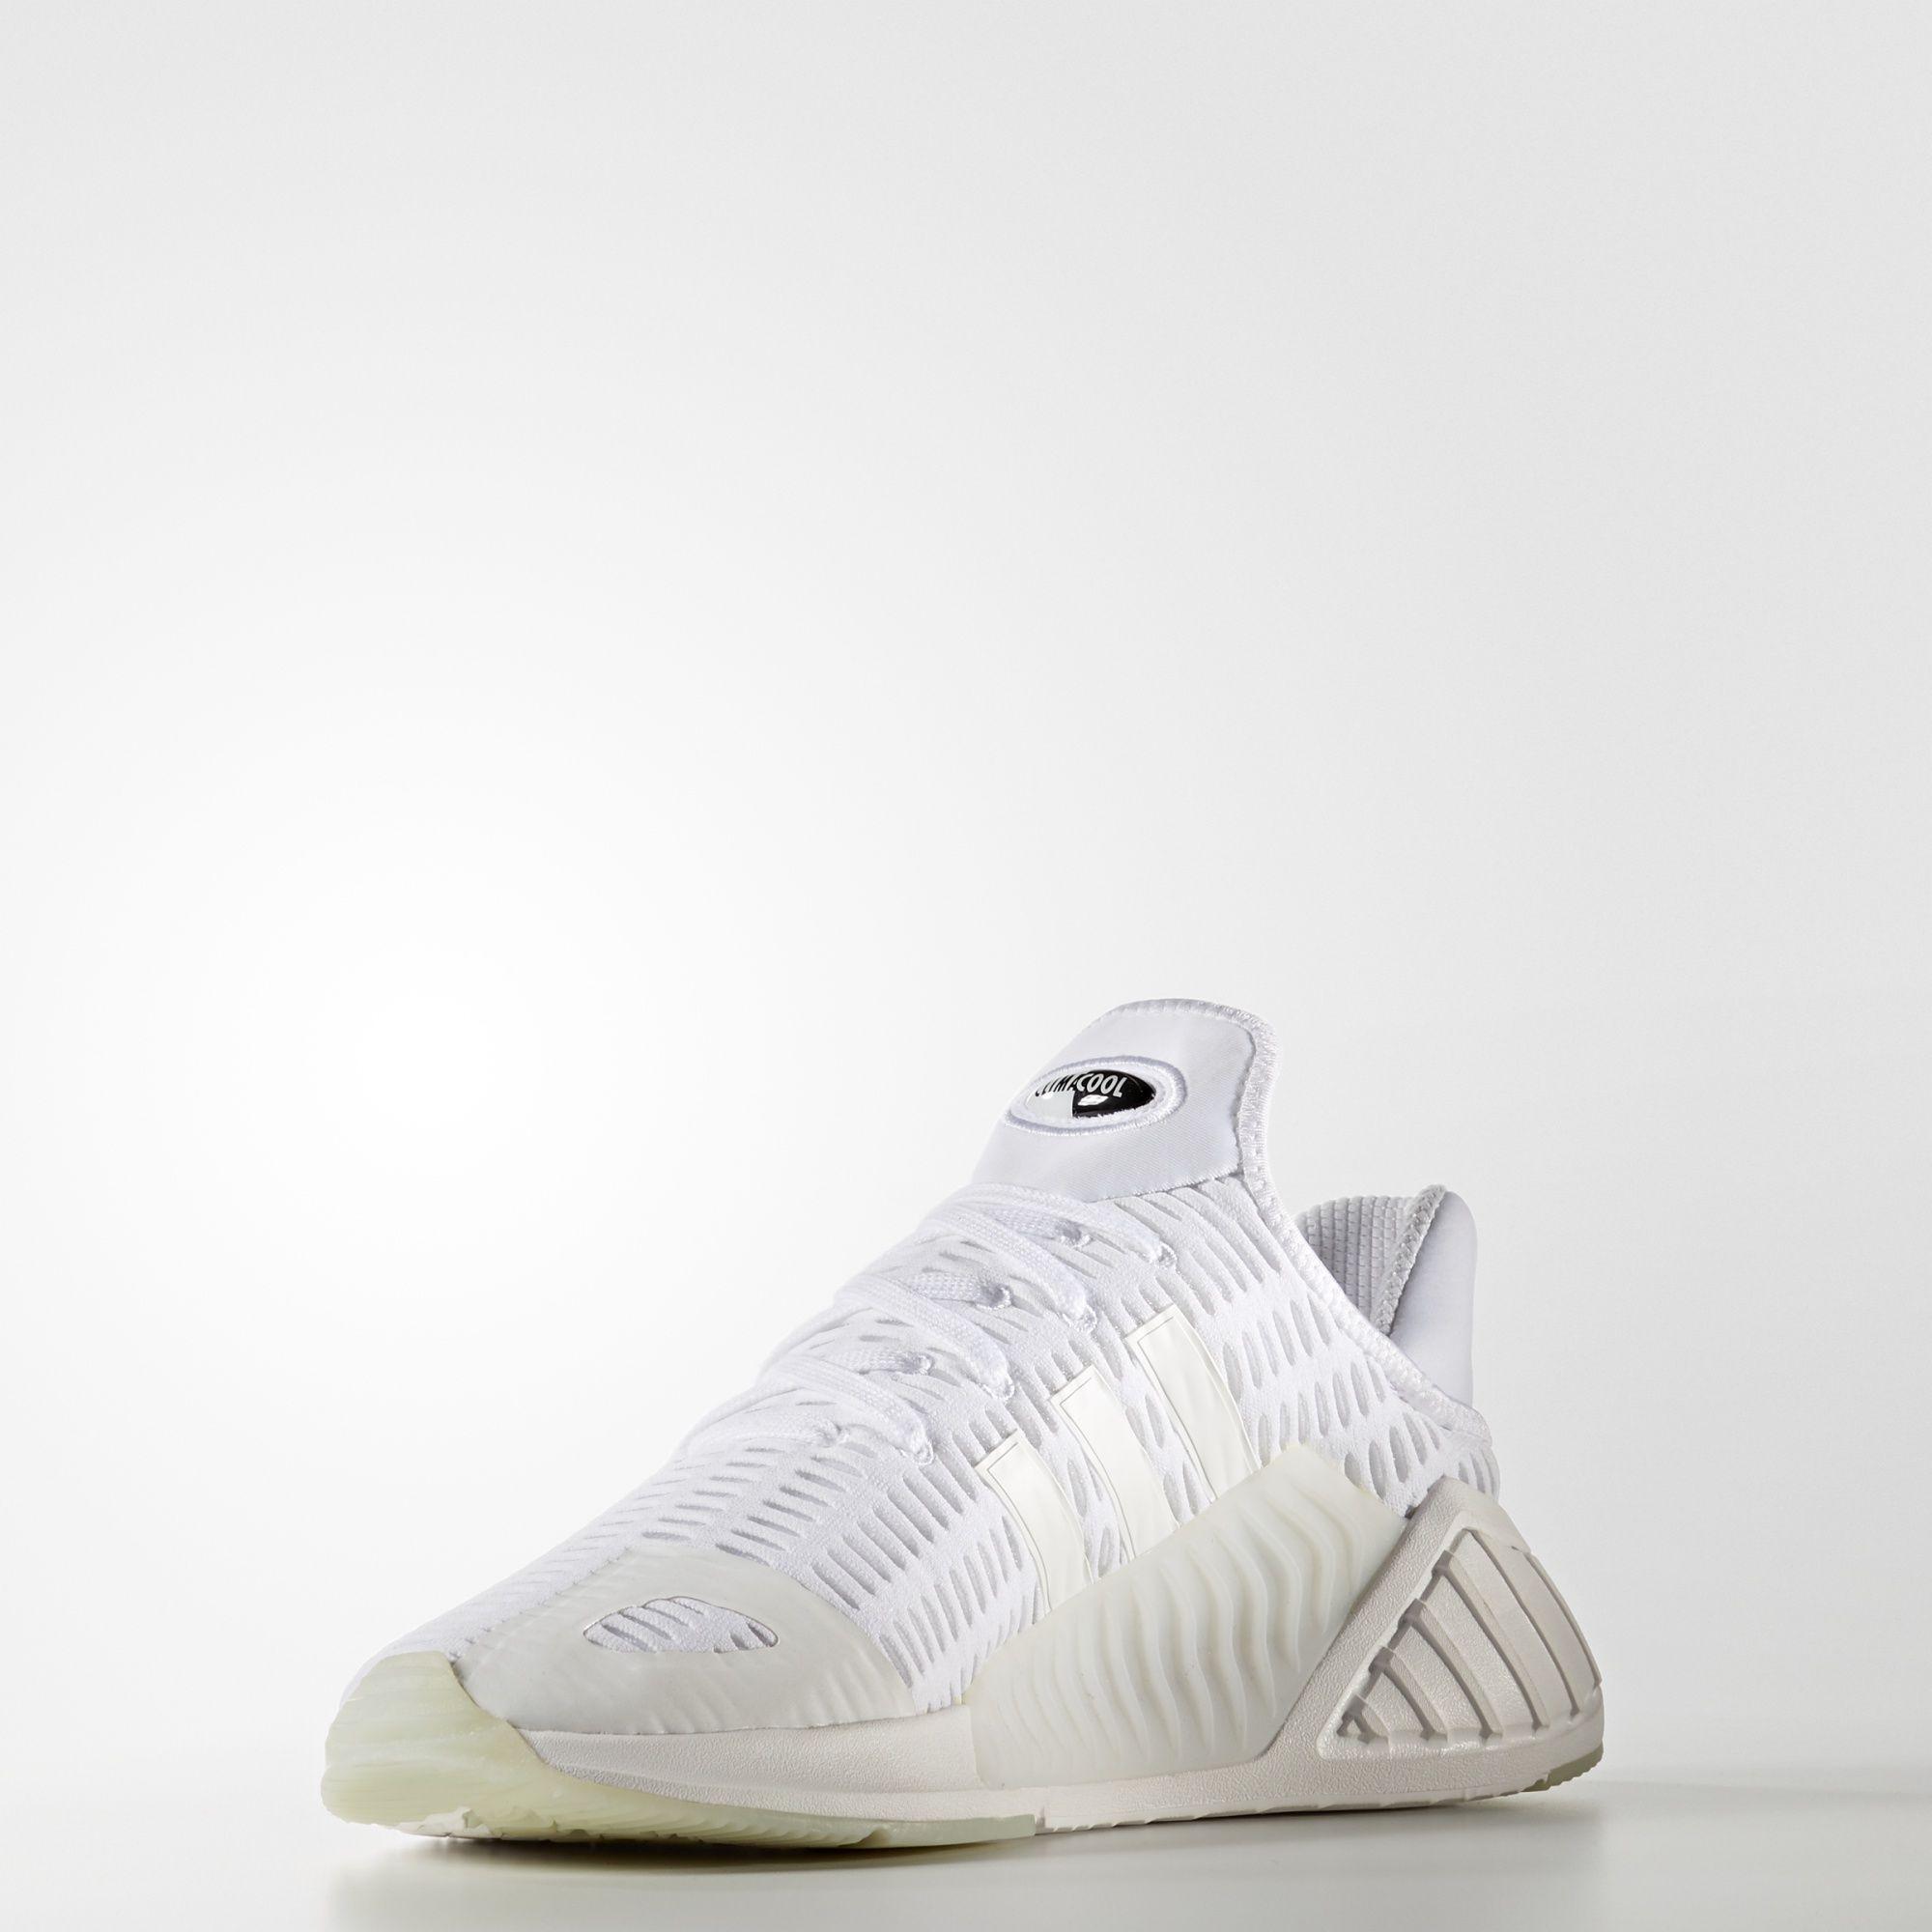 BZ0248 adidas ClimaCool 02 17 Triple White 2